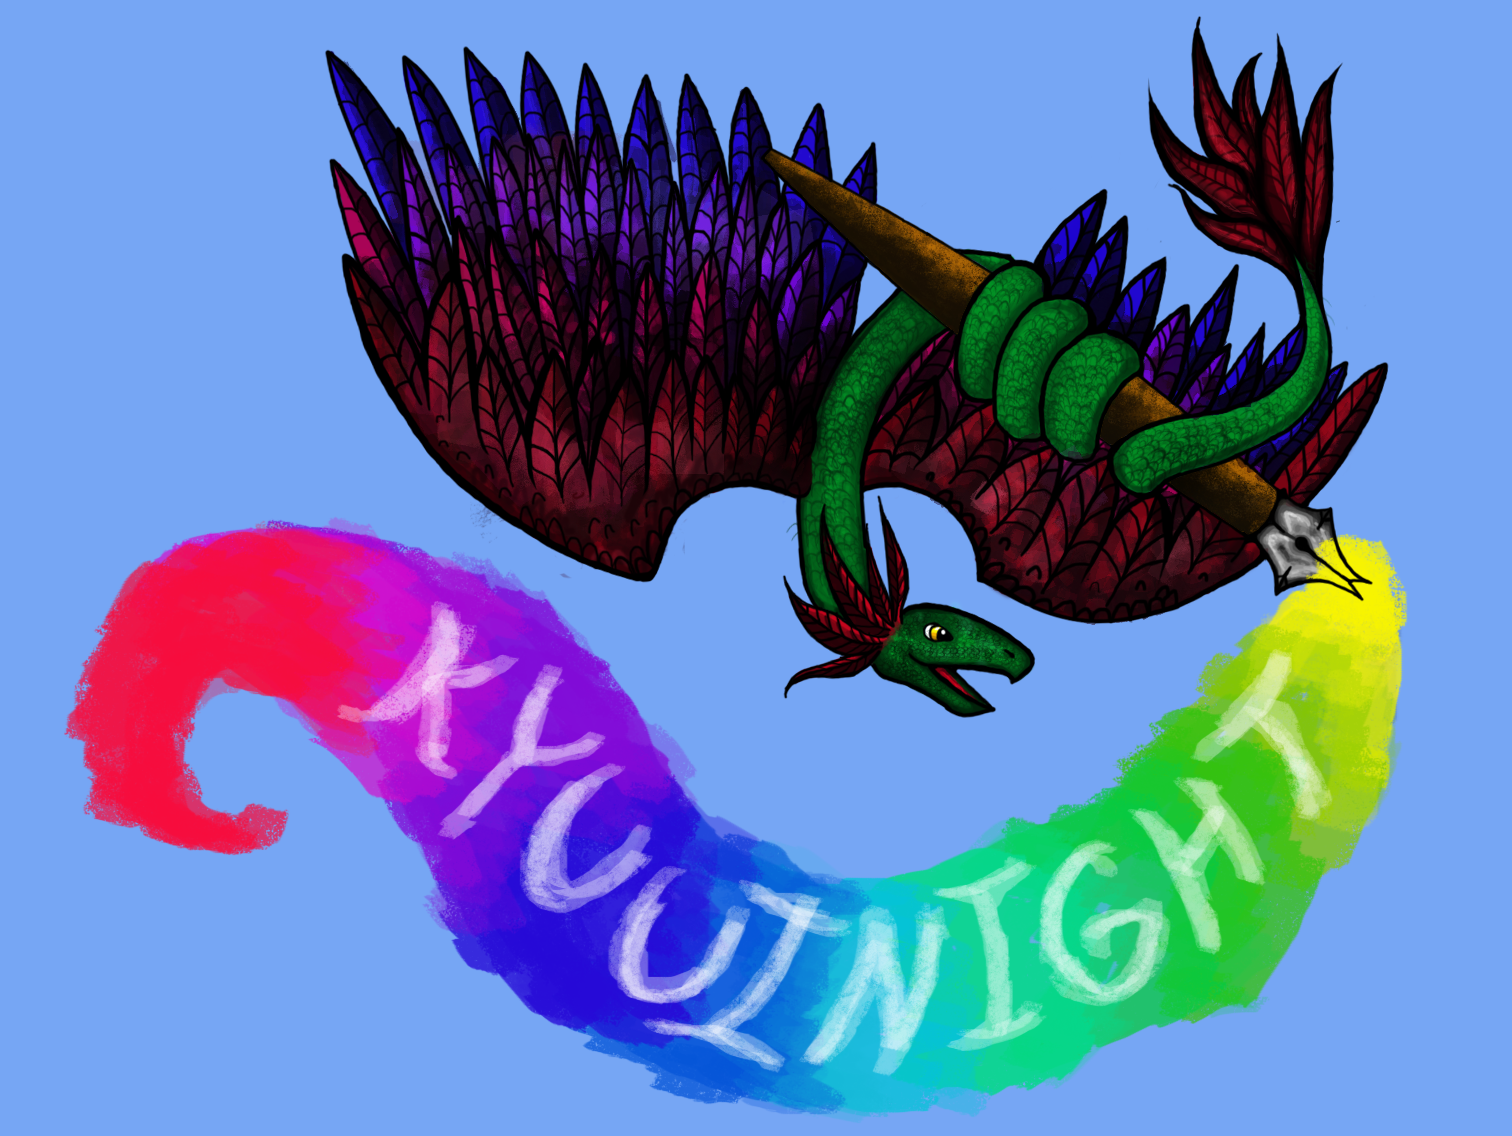 KyuubiNight's Profile Picture